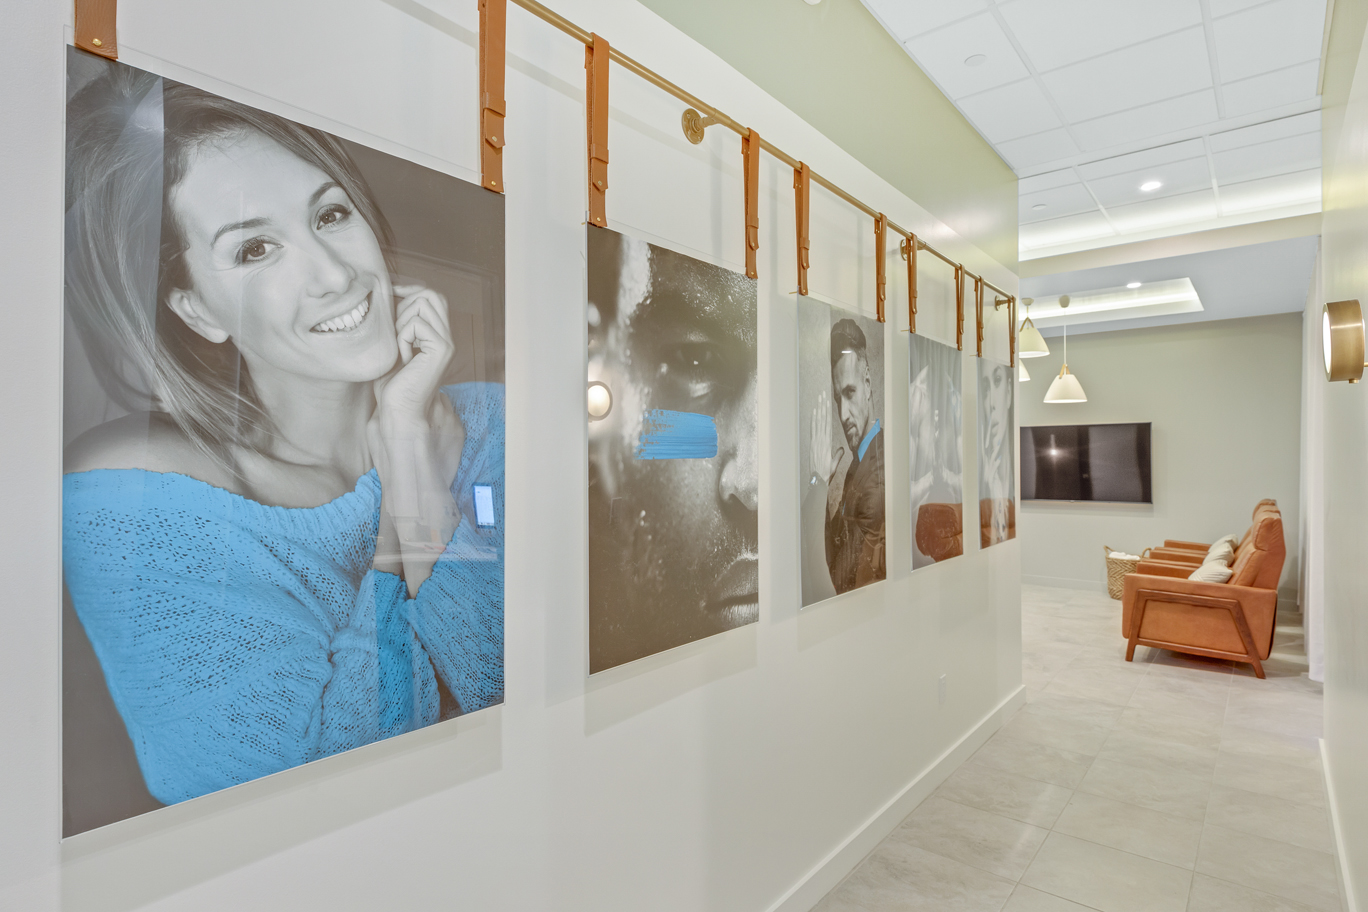 Studio 11 Designs - Brentwood, CA